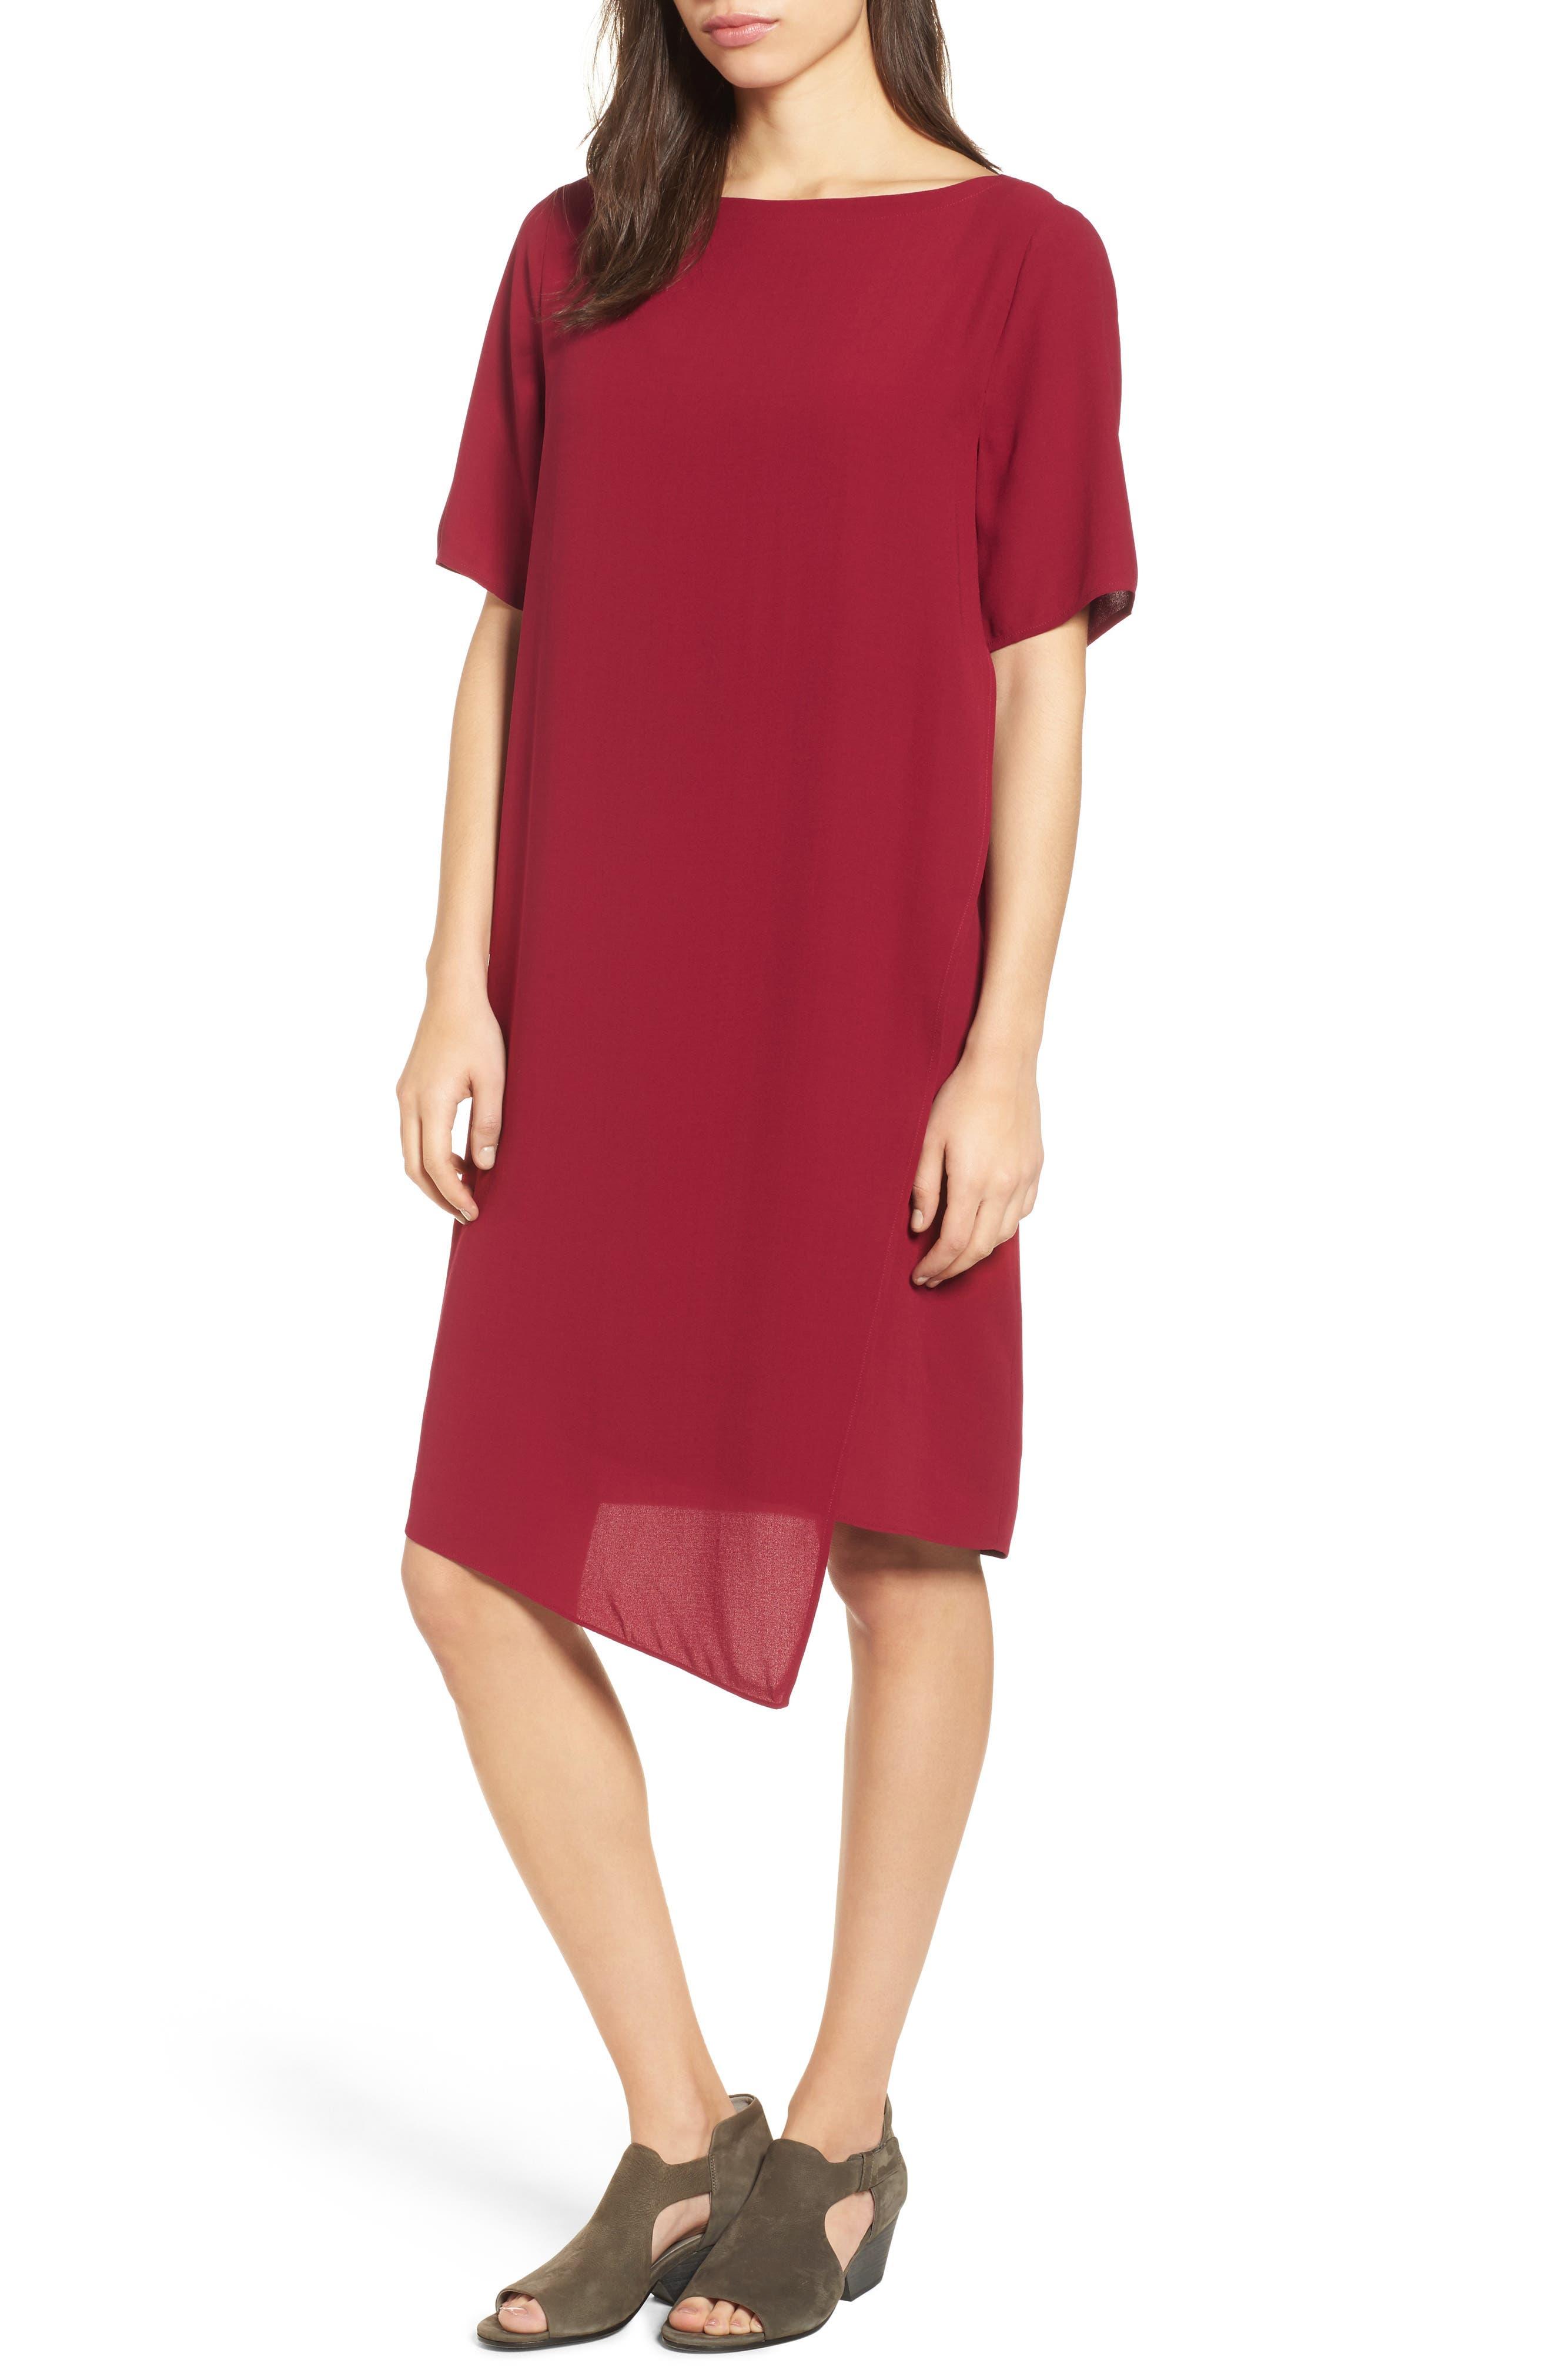 Alternate Image 1 Selected - Eileen Fisher Asymmetrical Silk Shift Dress (Regular & Petite)